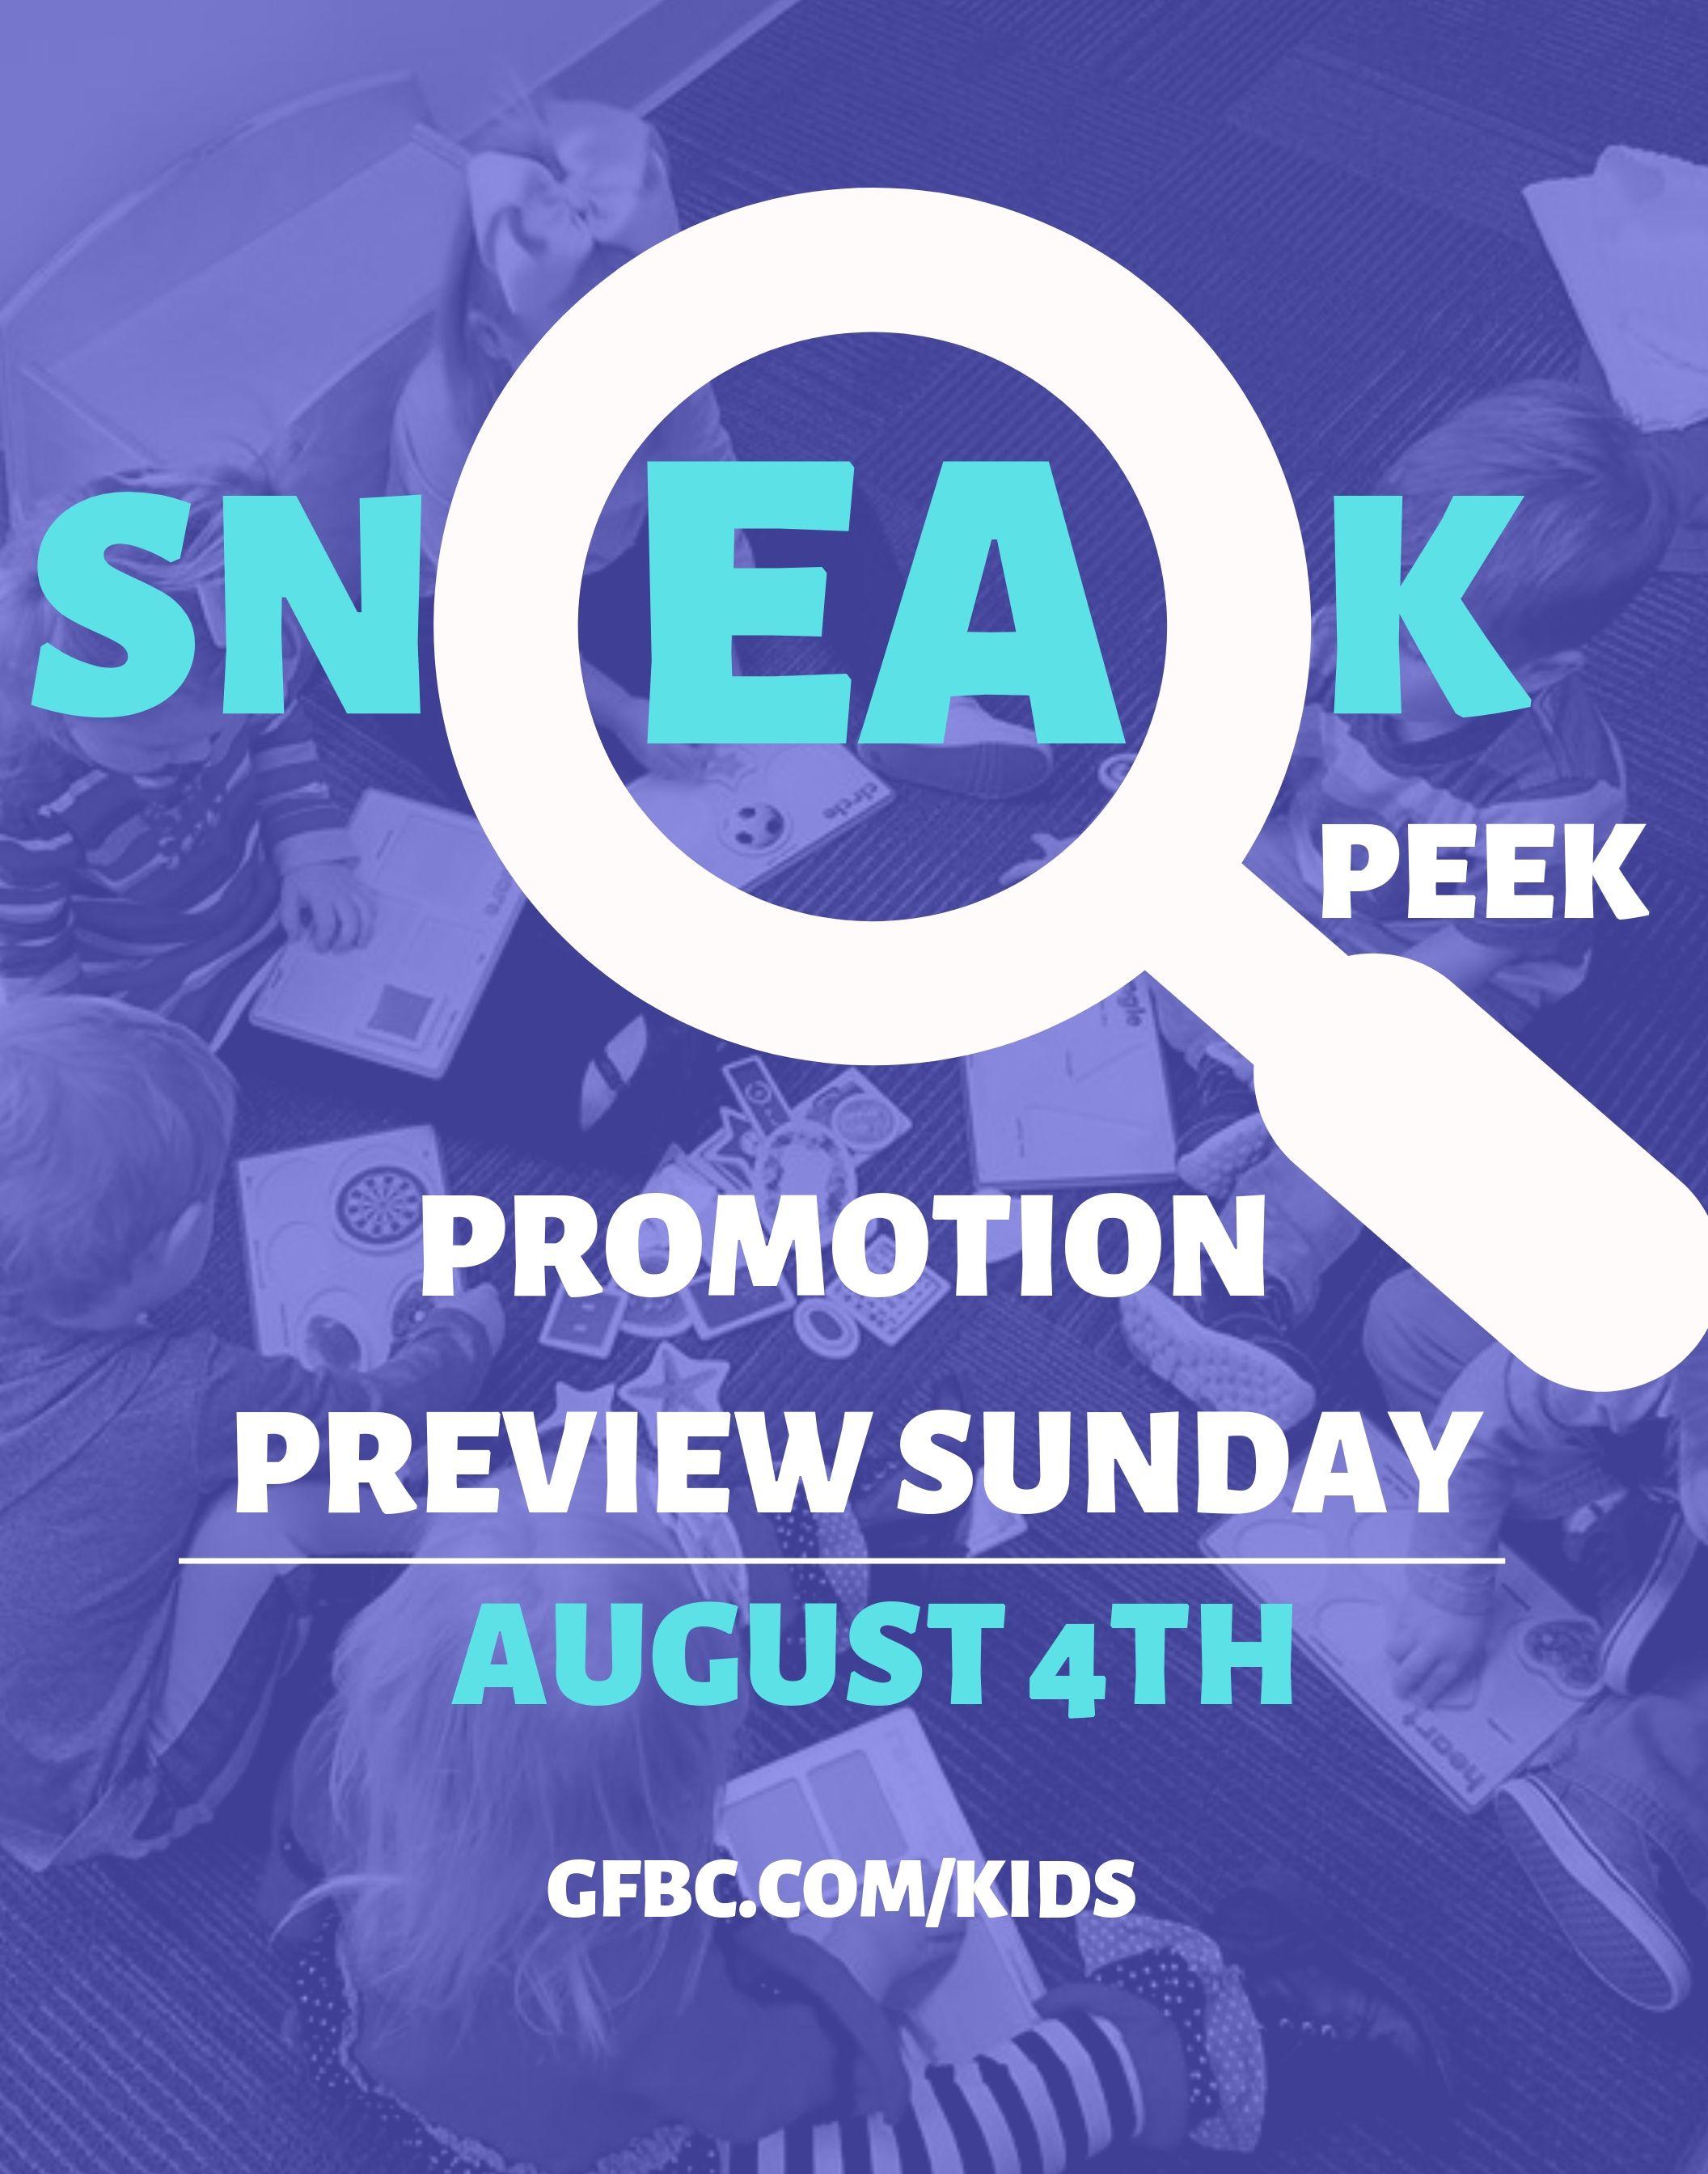 Sneak Peek Promo (1).jpg